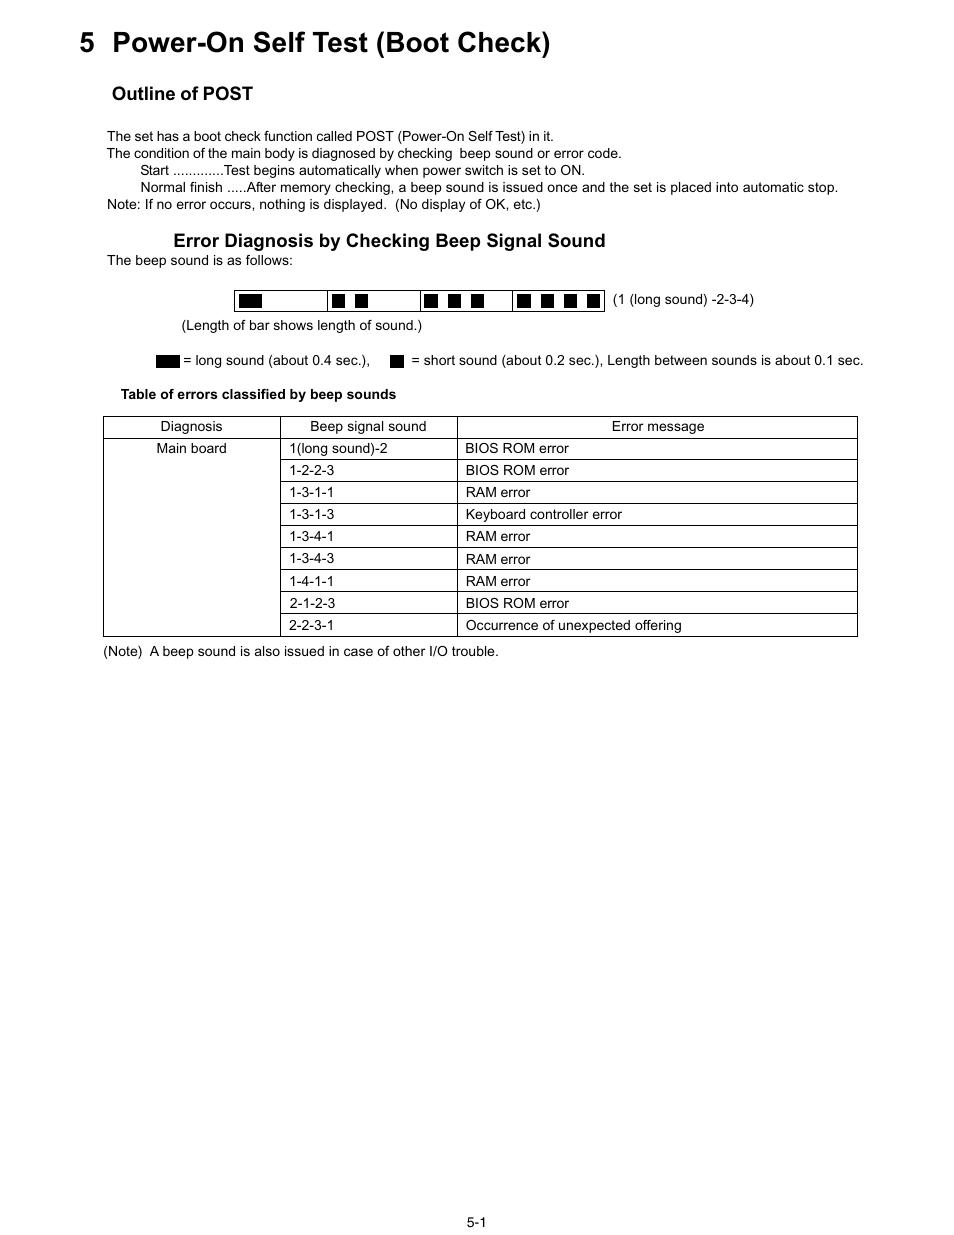 5 power-on self test (boot check) | Matsushita CF-30 User Manual